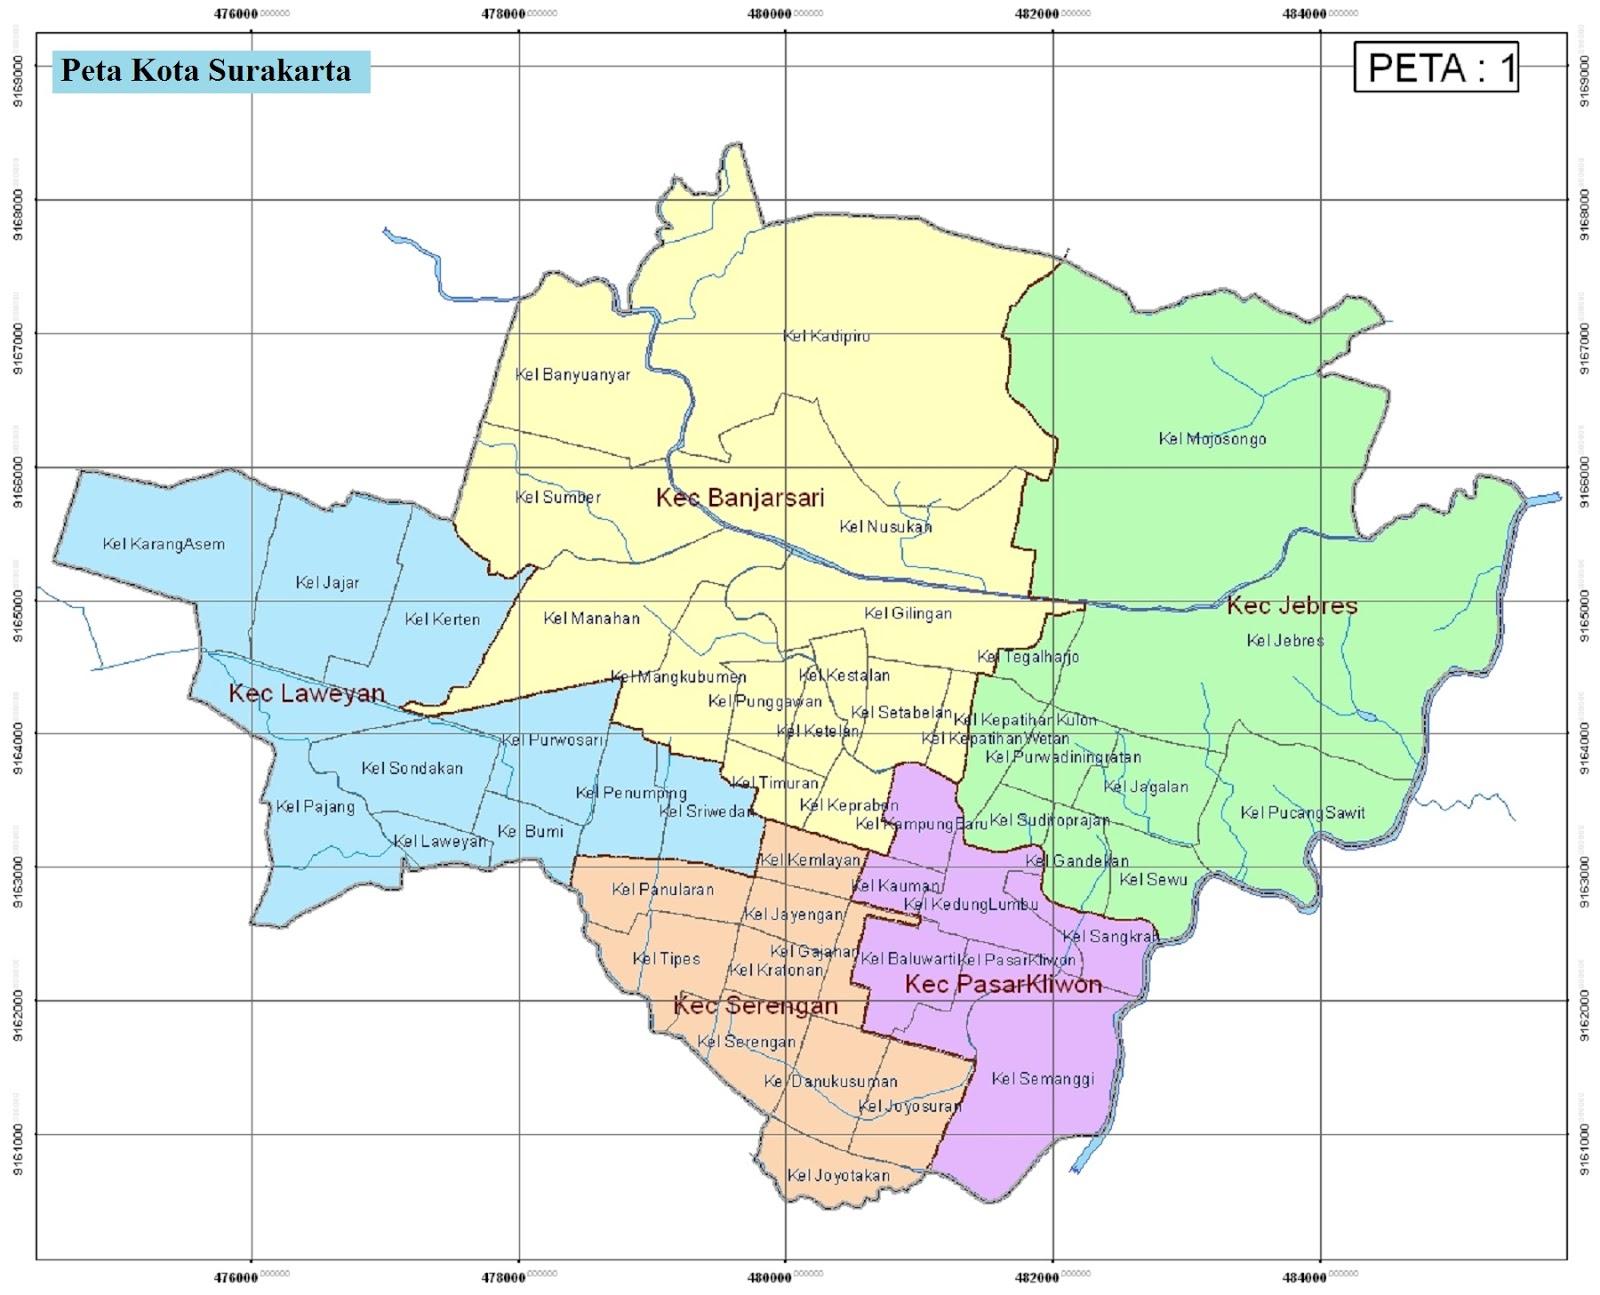 Peta Kota Surakarta